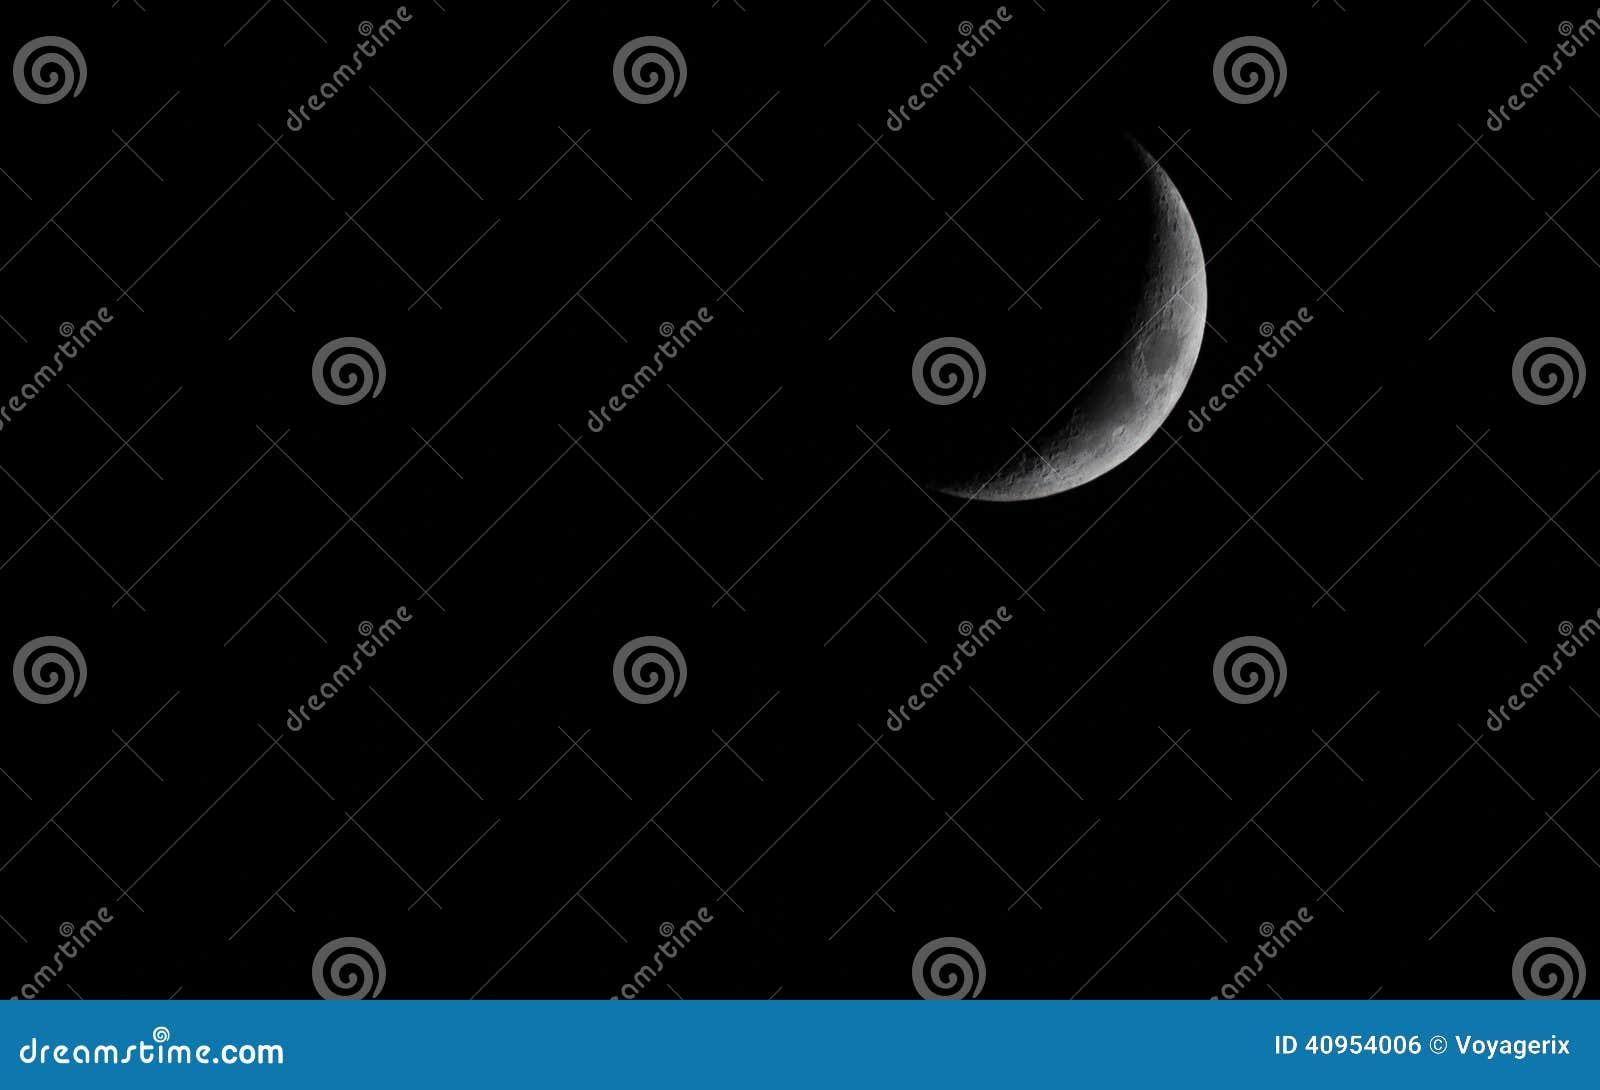 Skyscape  Dark Night Sky With Moon  Astronomy  Stock Photo - Image